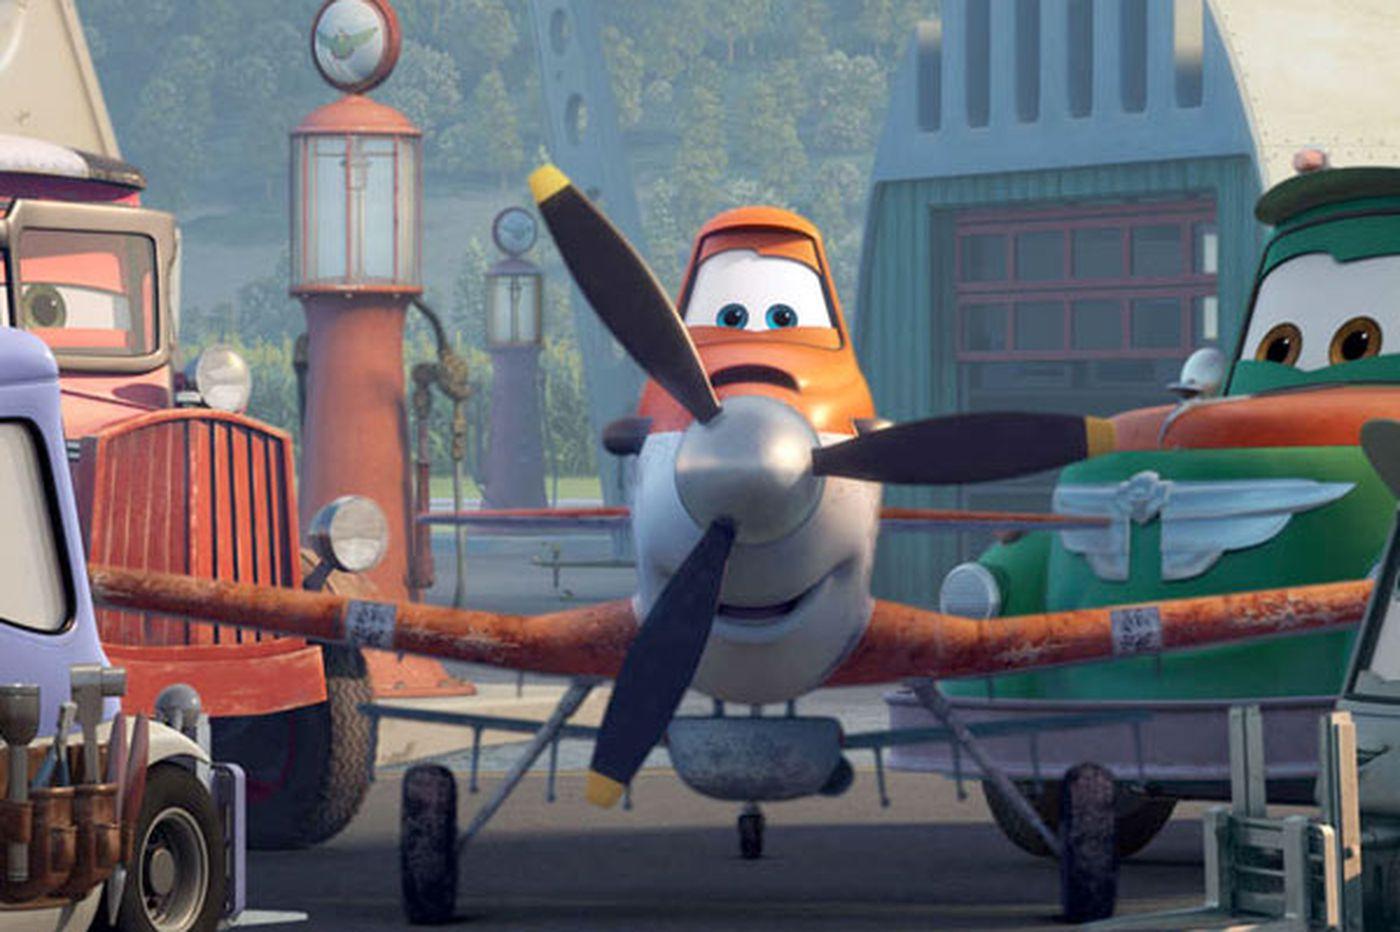 Disney's 'Planes' crashes and burns